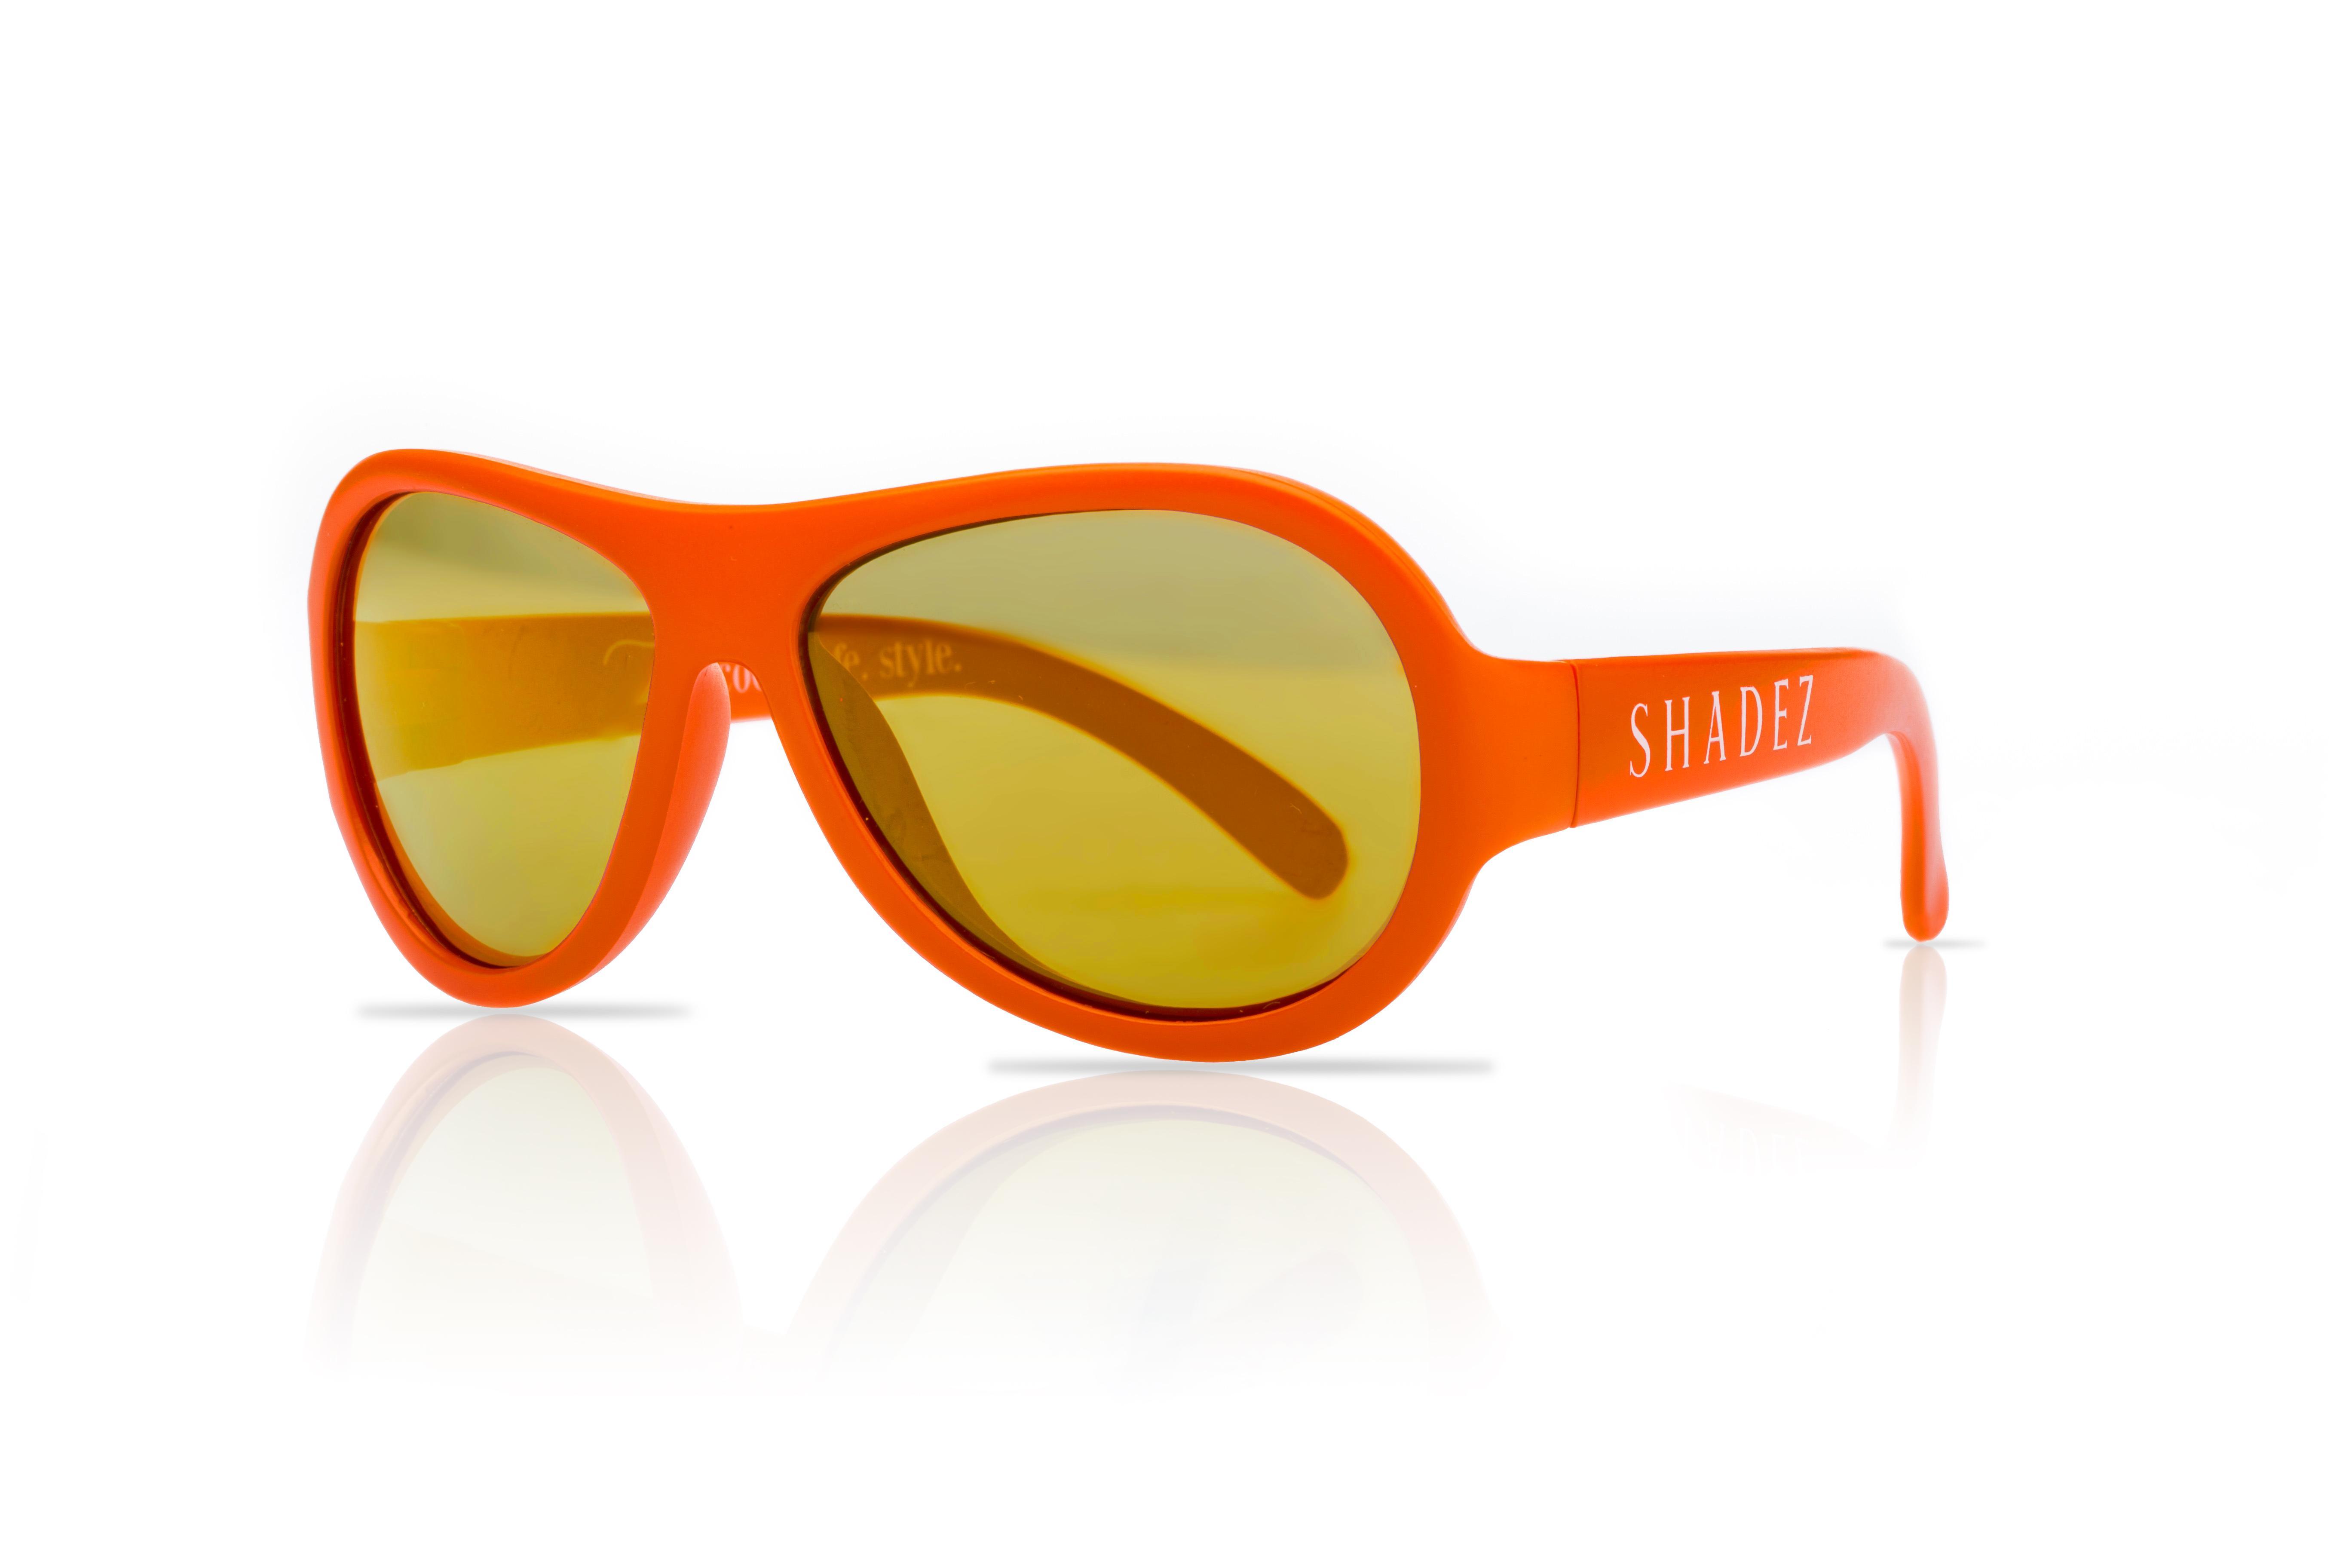 ShadeZ - Γυαλιά ηλίου ShadeZ 7-16  da81000402a